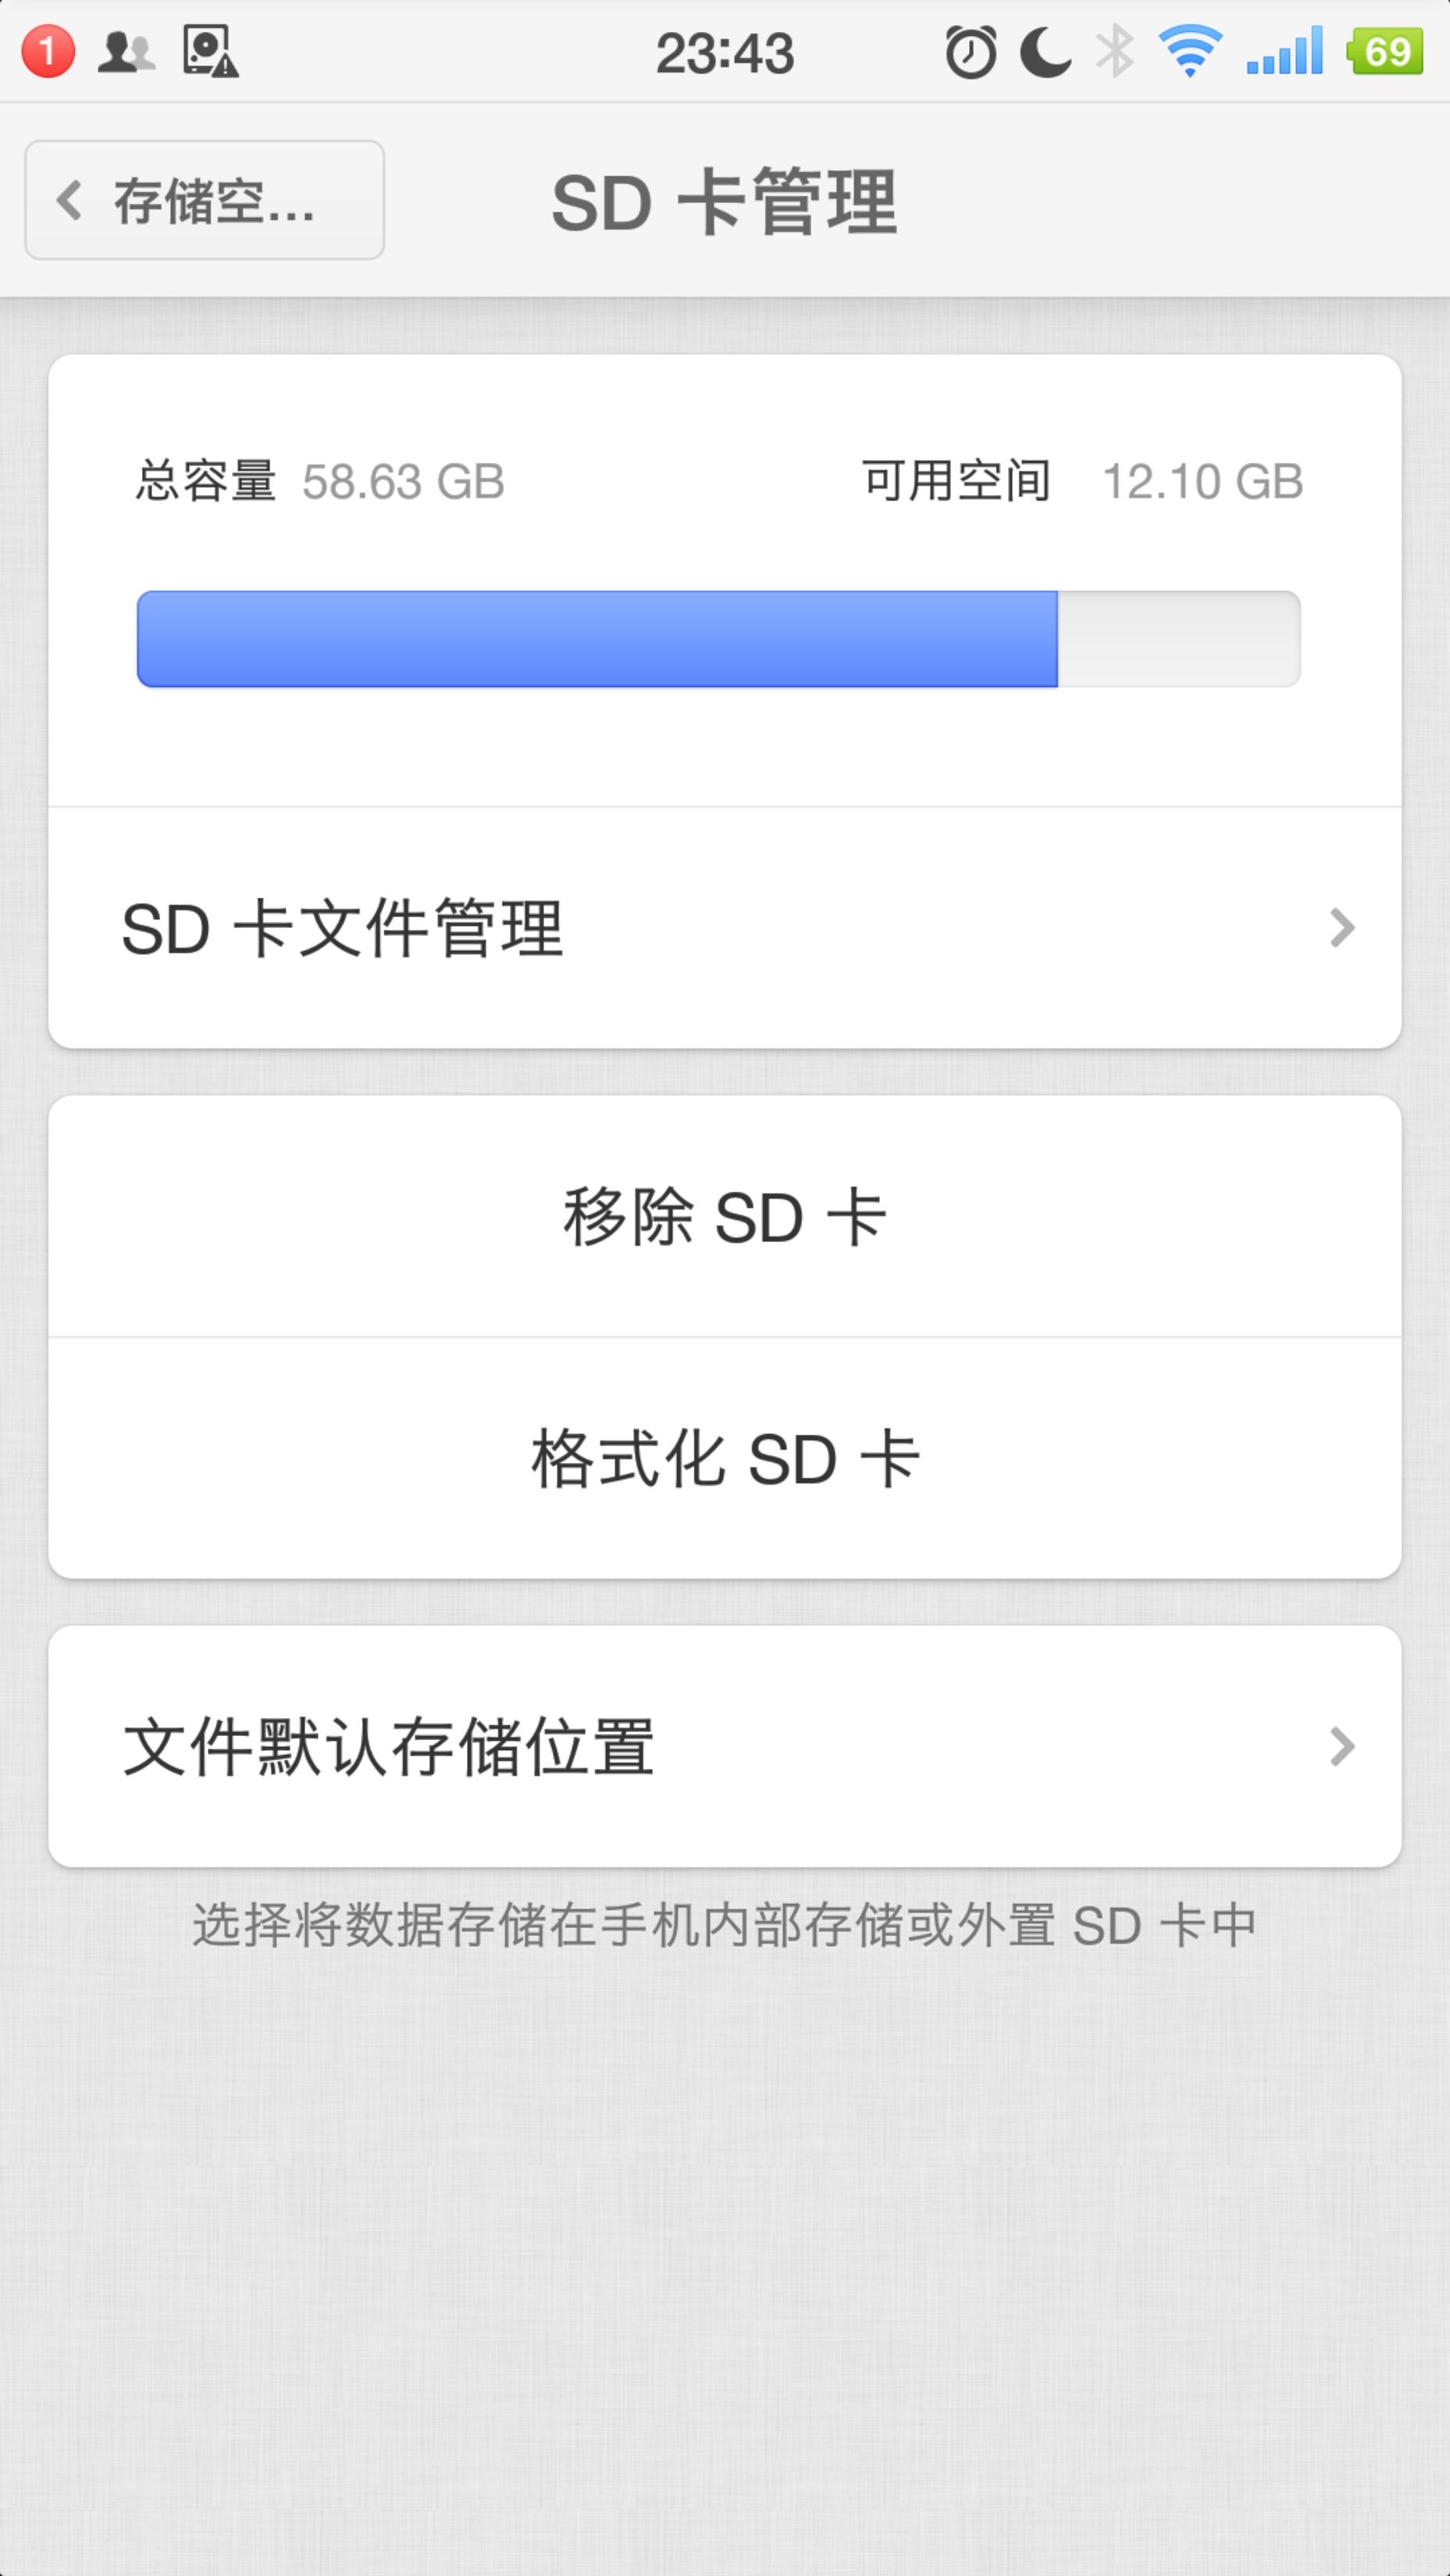 ??_Screenshot_2020-06-09-23-43-33-277_??.png